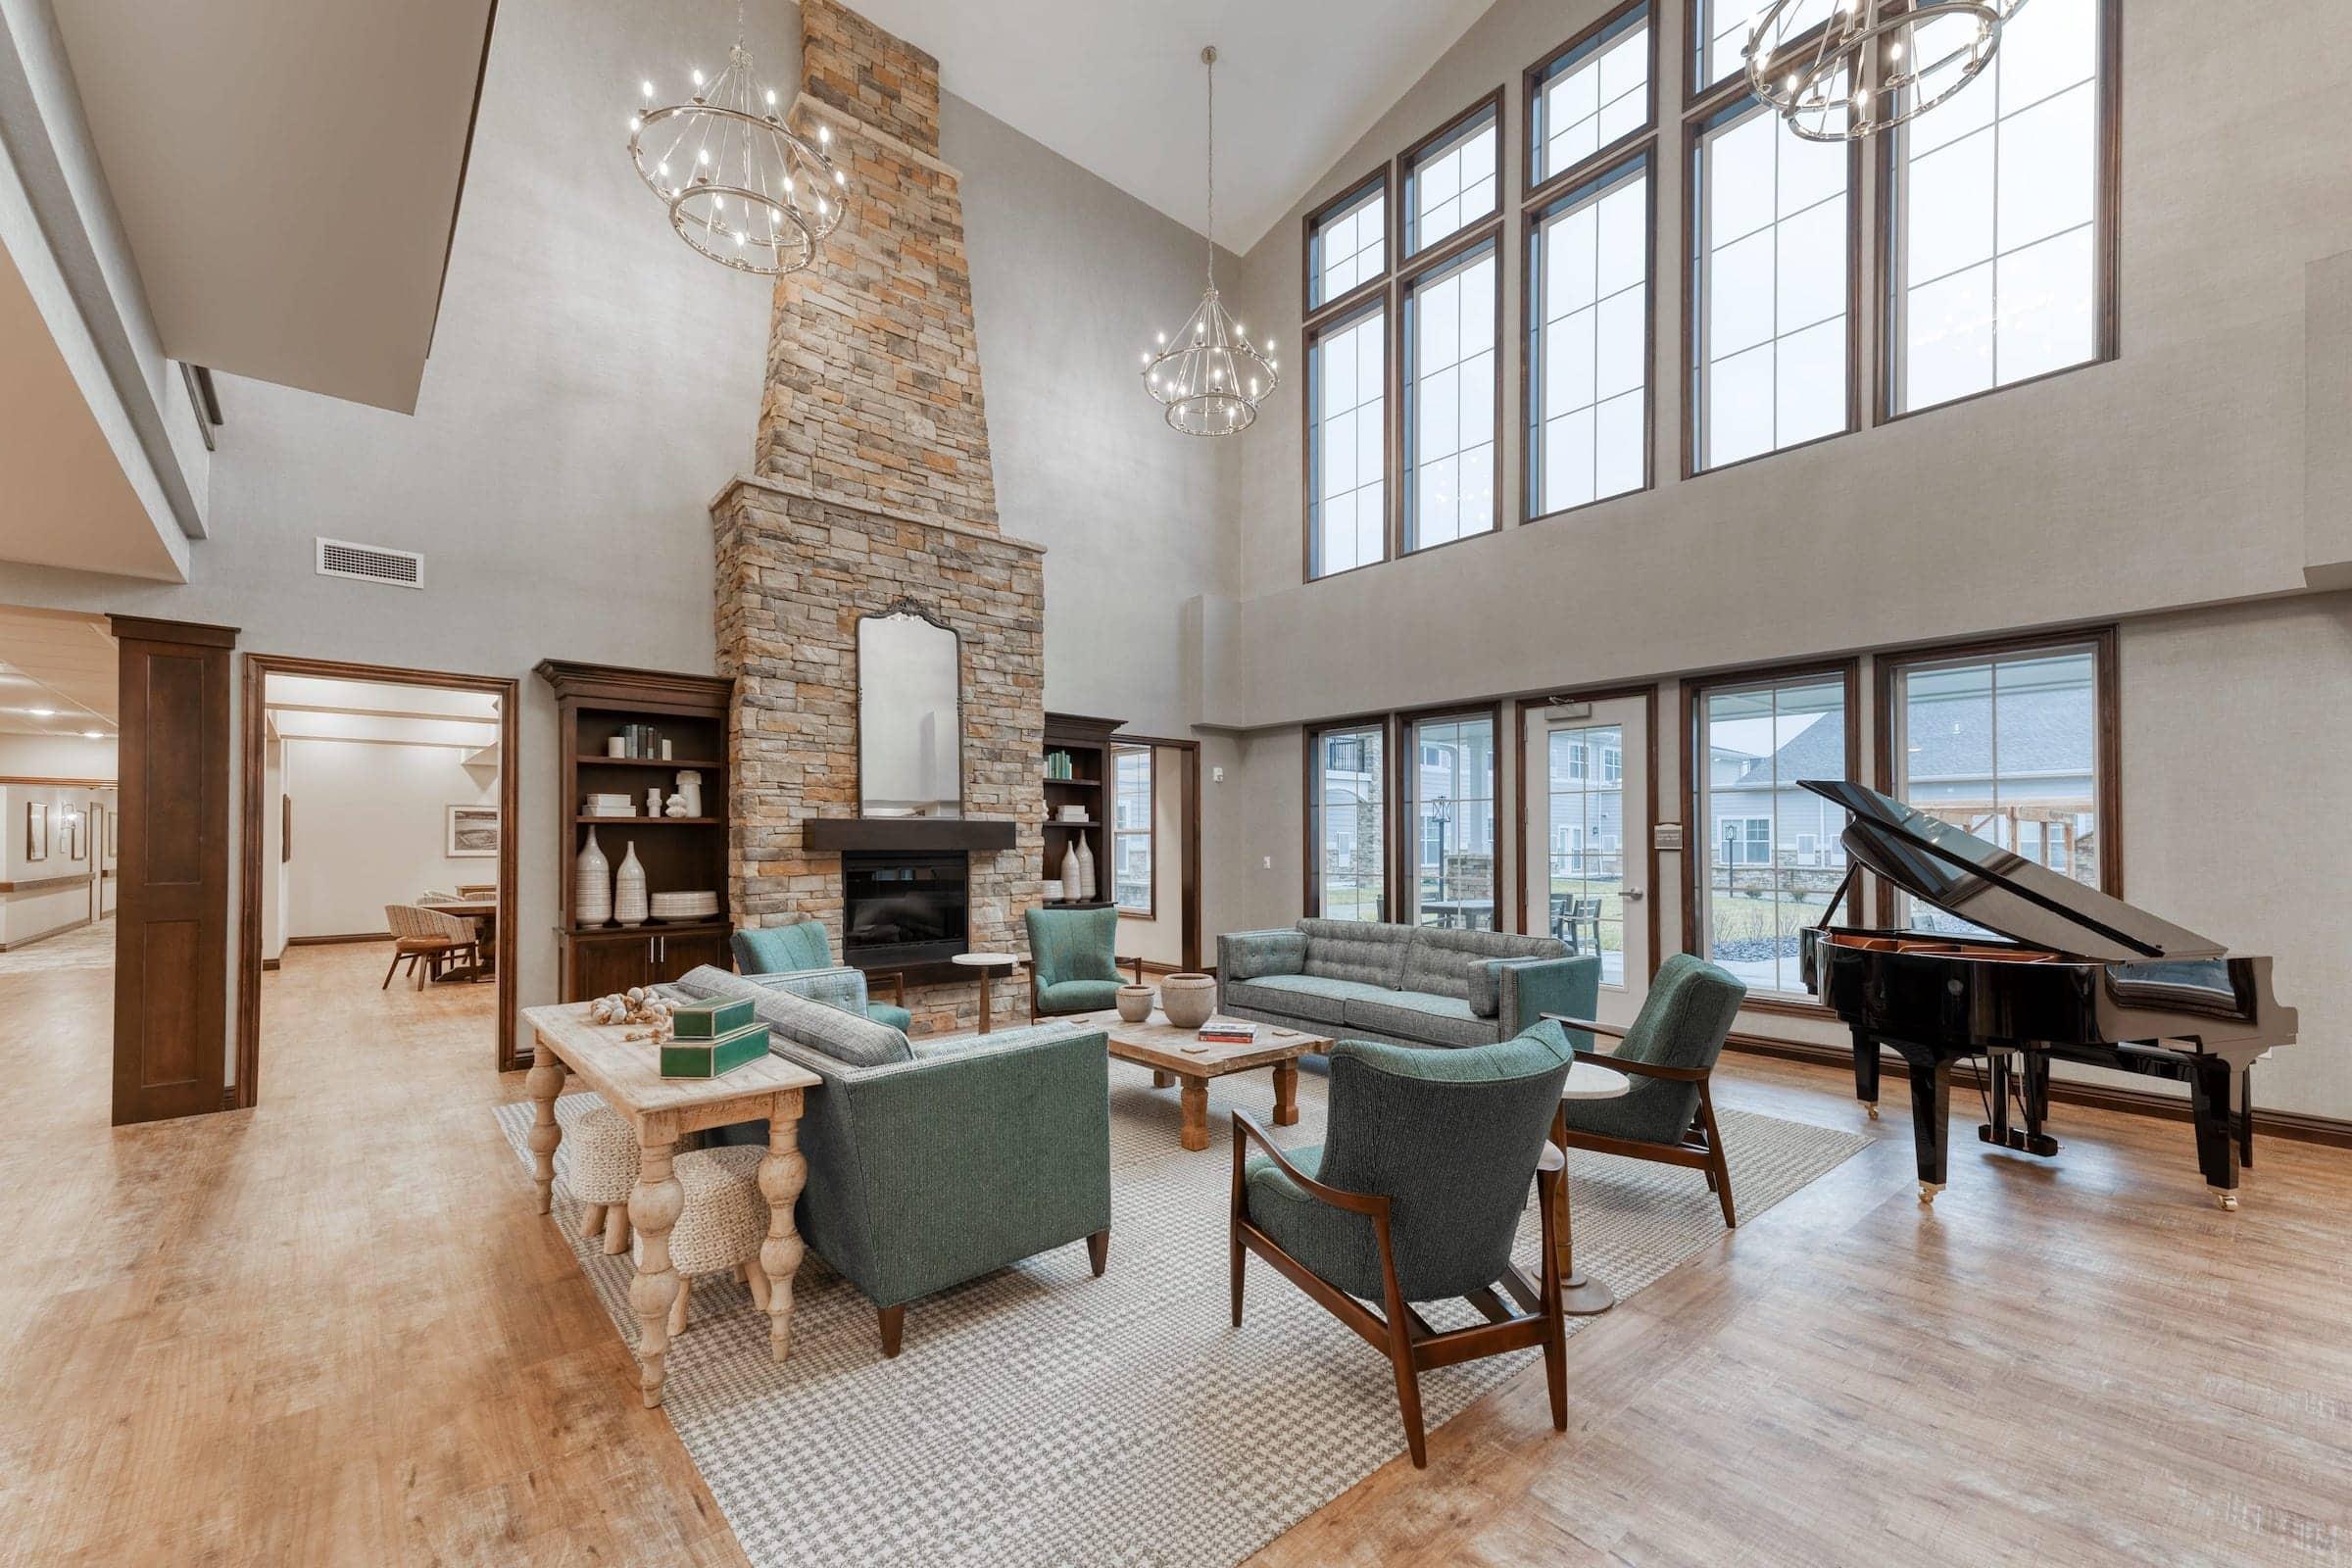 Cedarhurst Arnold open lobby with custom stone fireplace